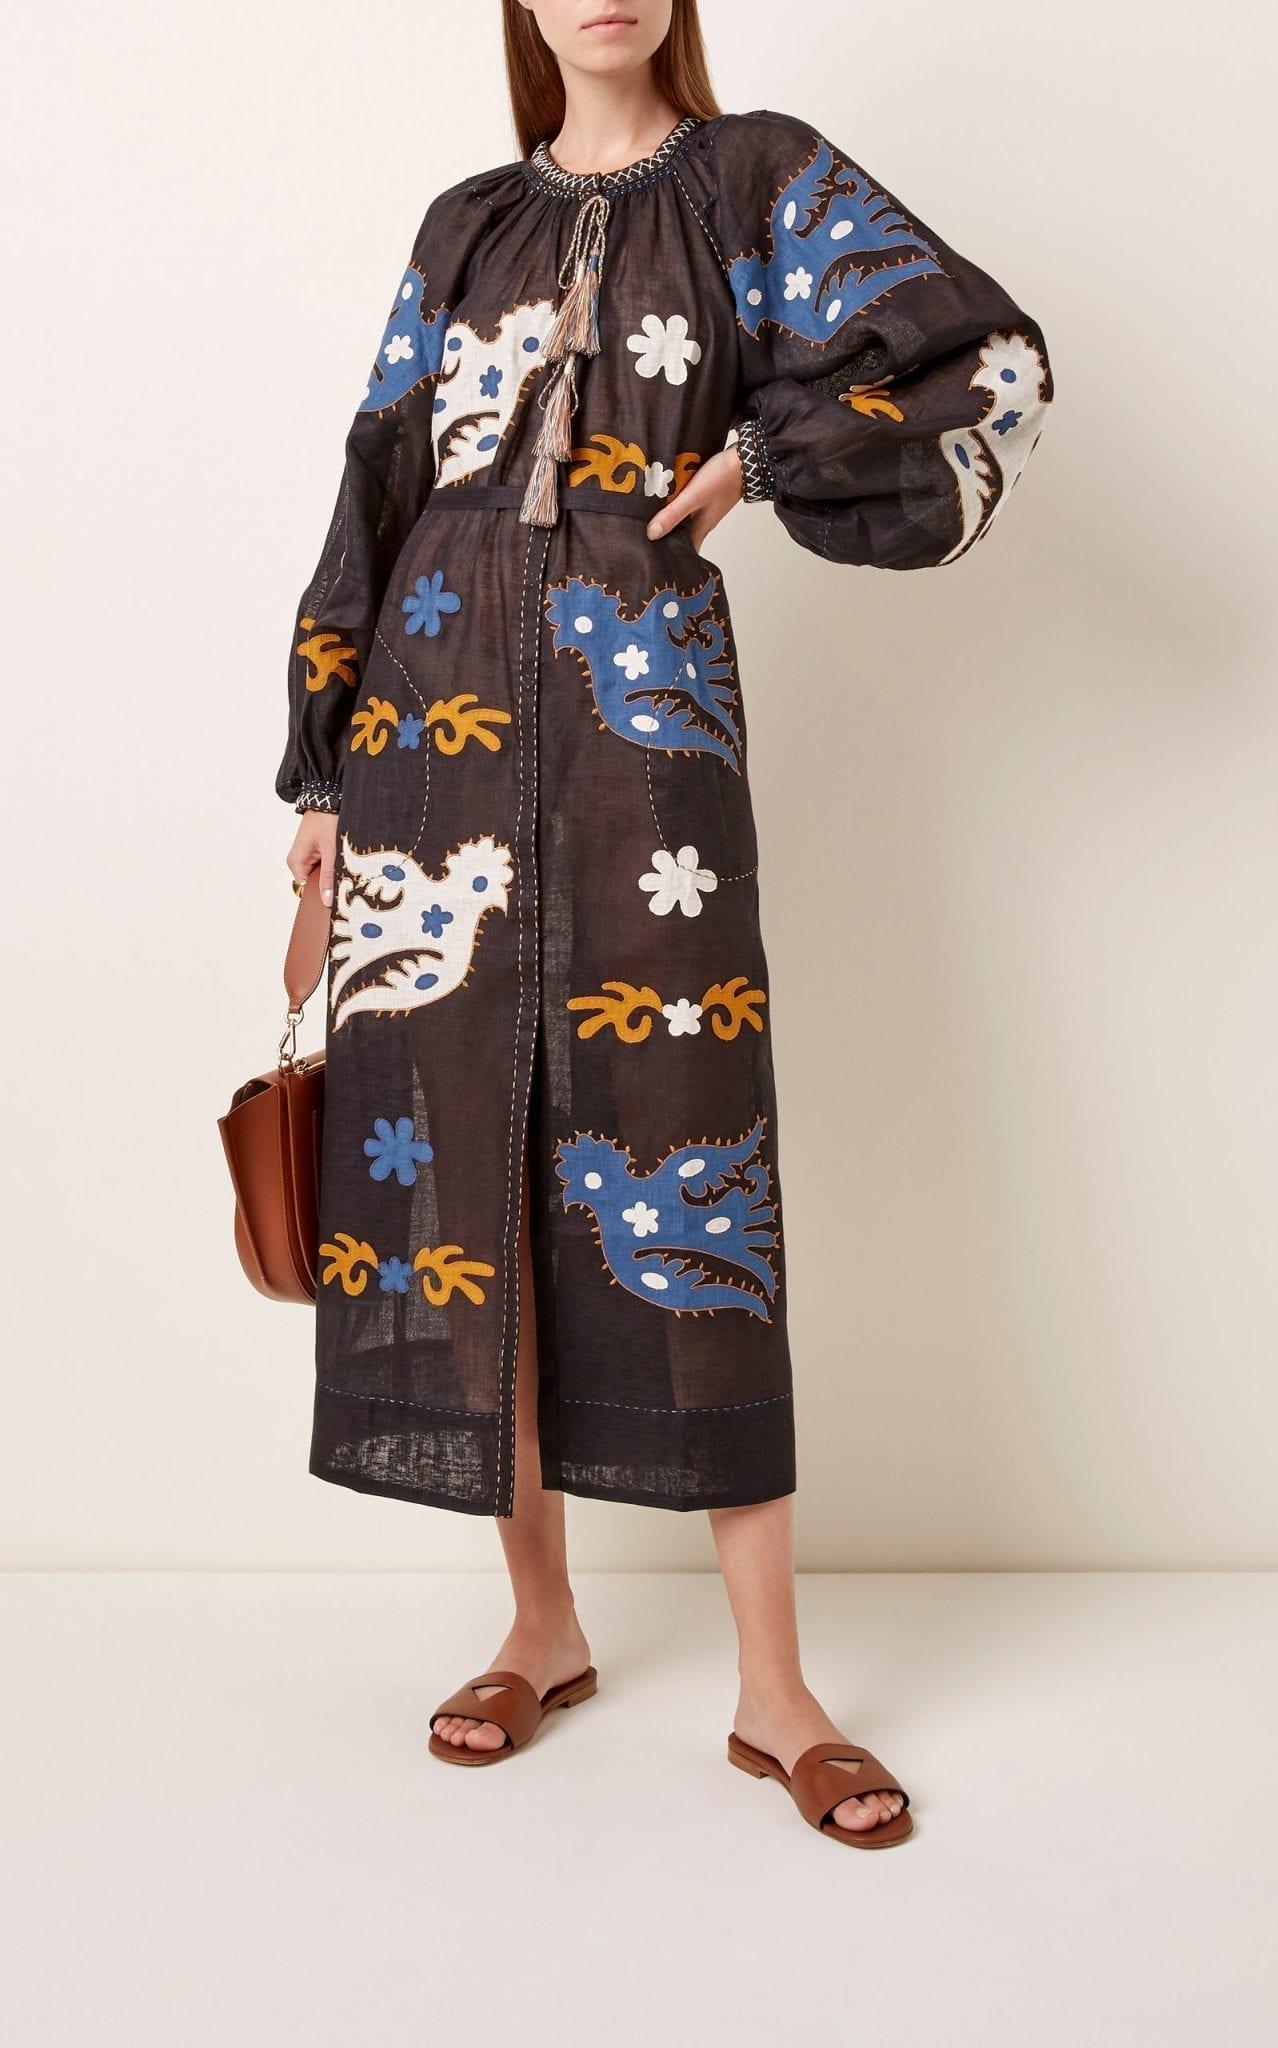 VITA KIN Parrot Appliquéd Embroidered Linen Midi Dress